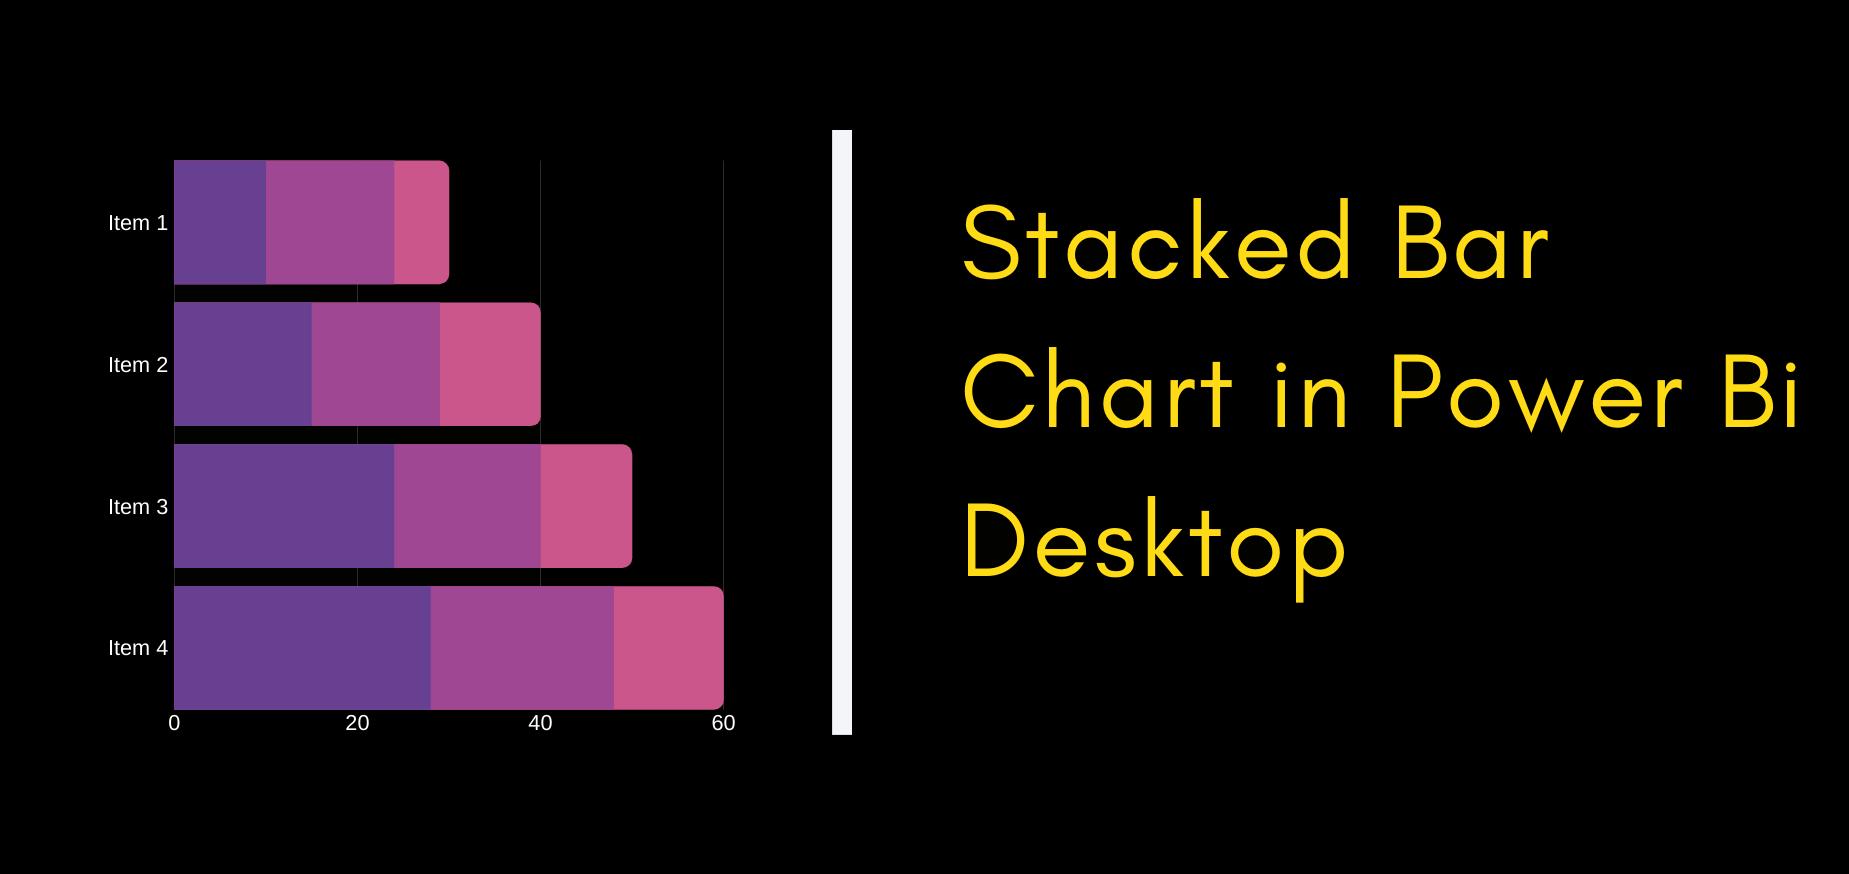 Stacked Bar Chart in Power Bi Desktop